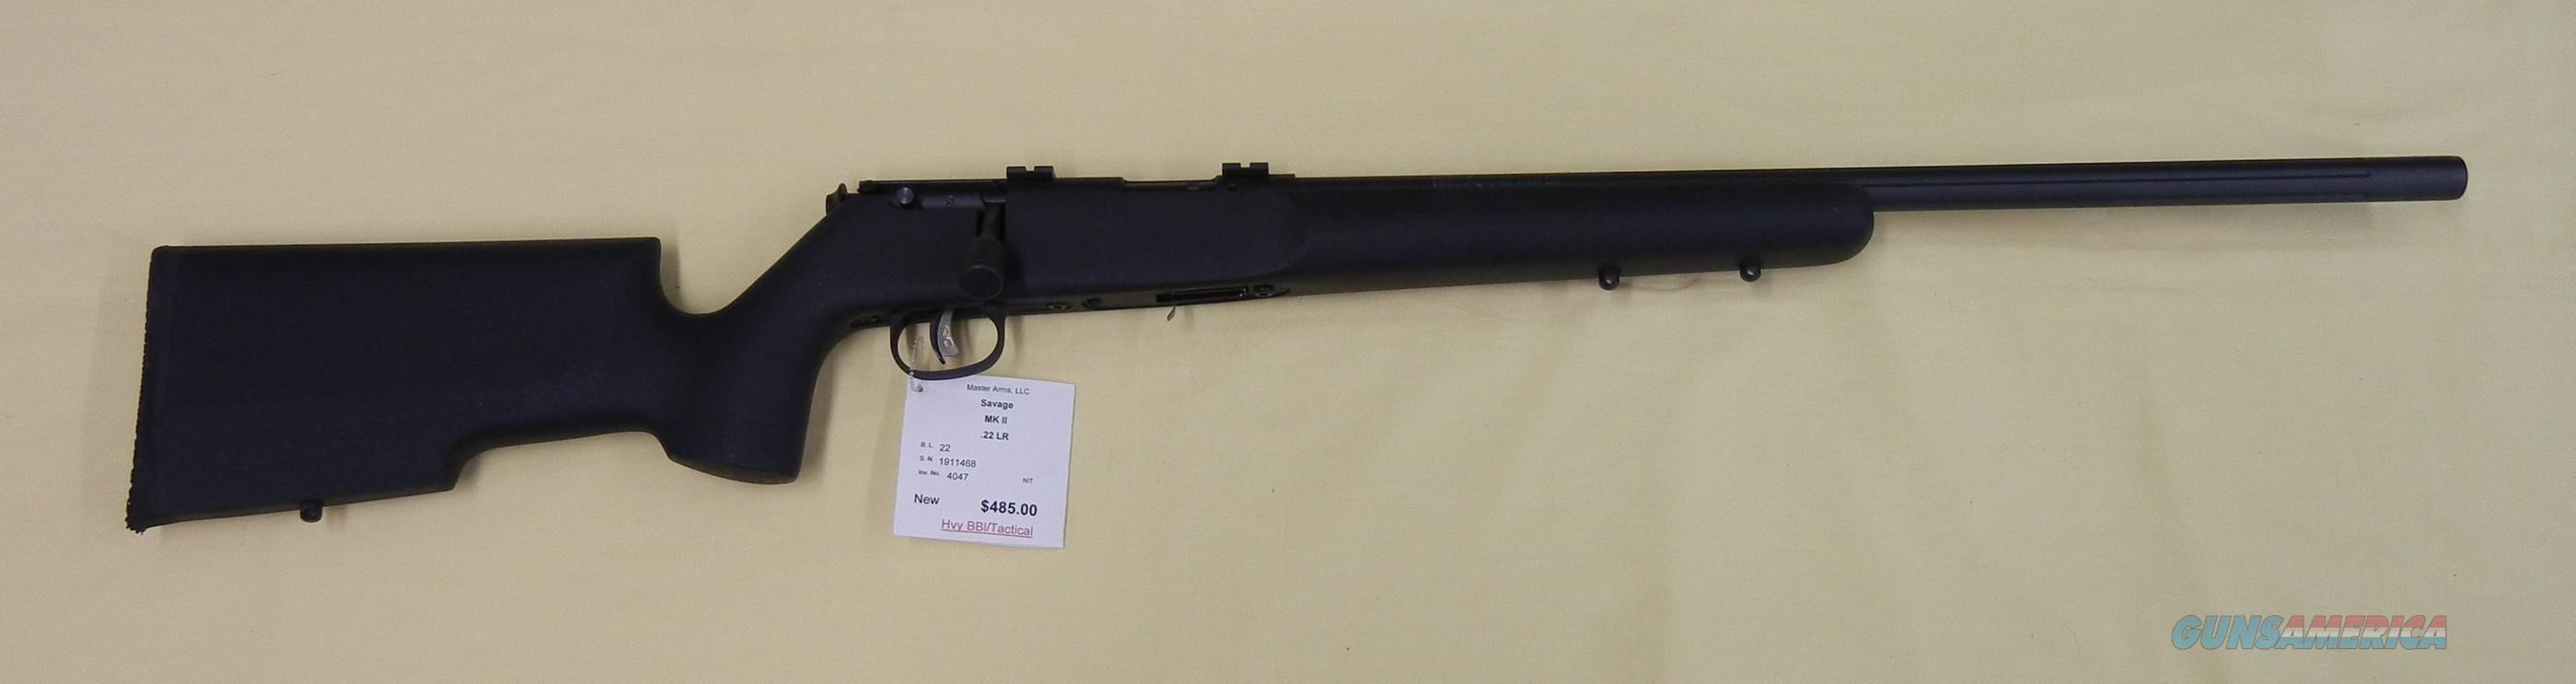 SAVAGE MKII  Guns > Rifles > Savage Rifles > Rimfire